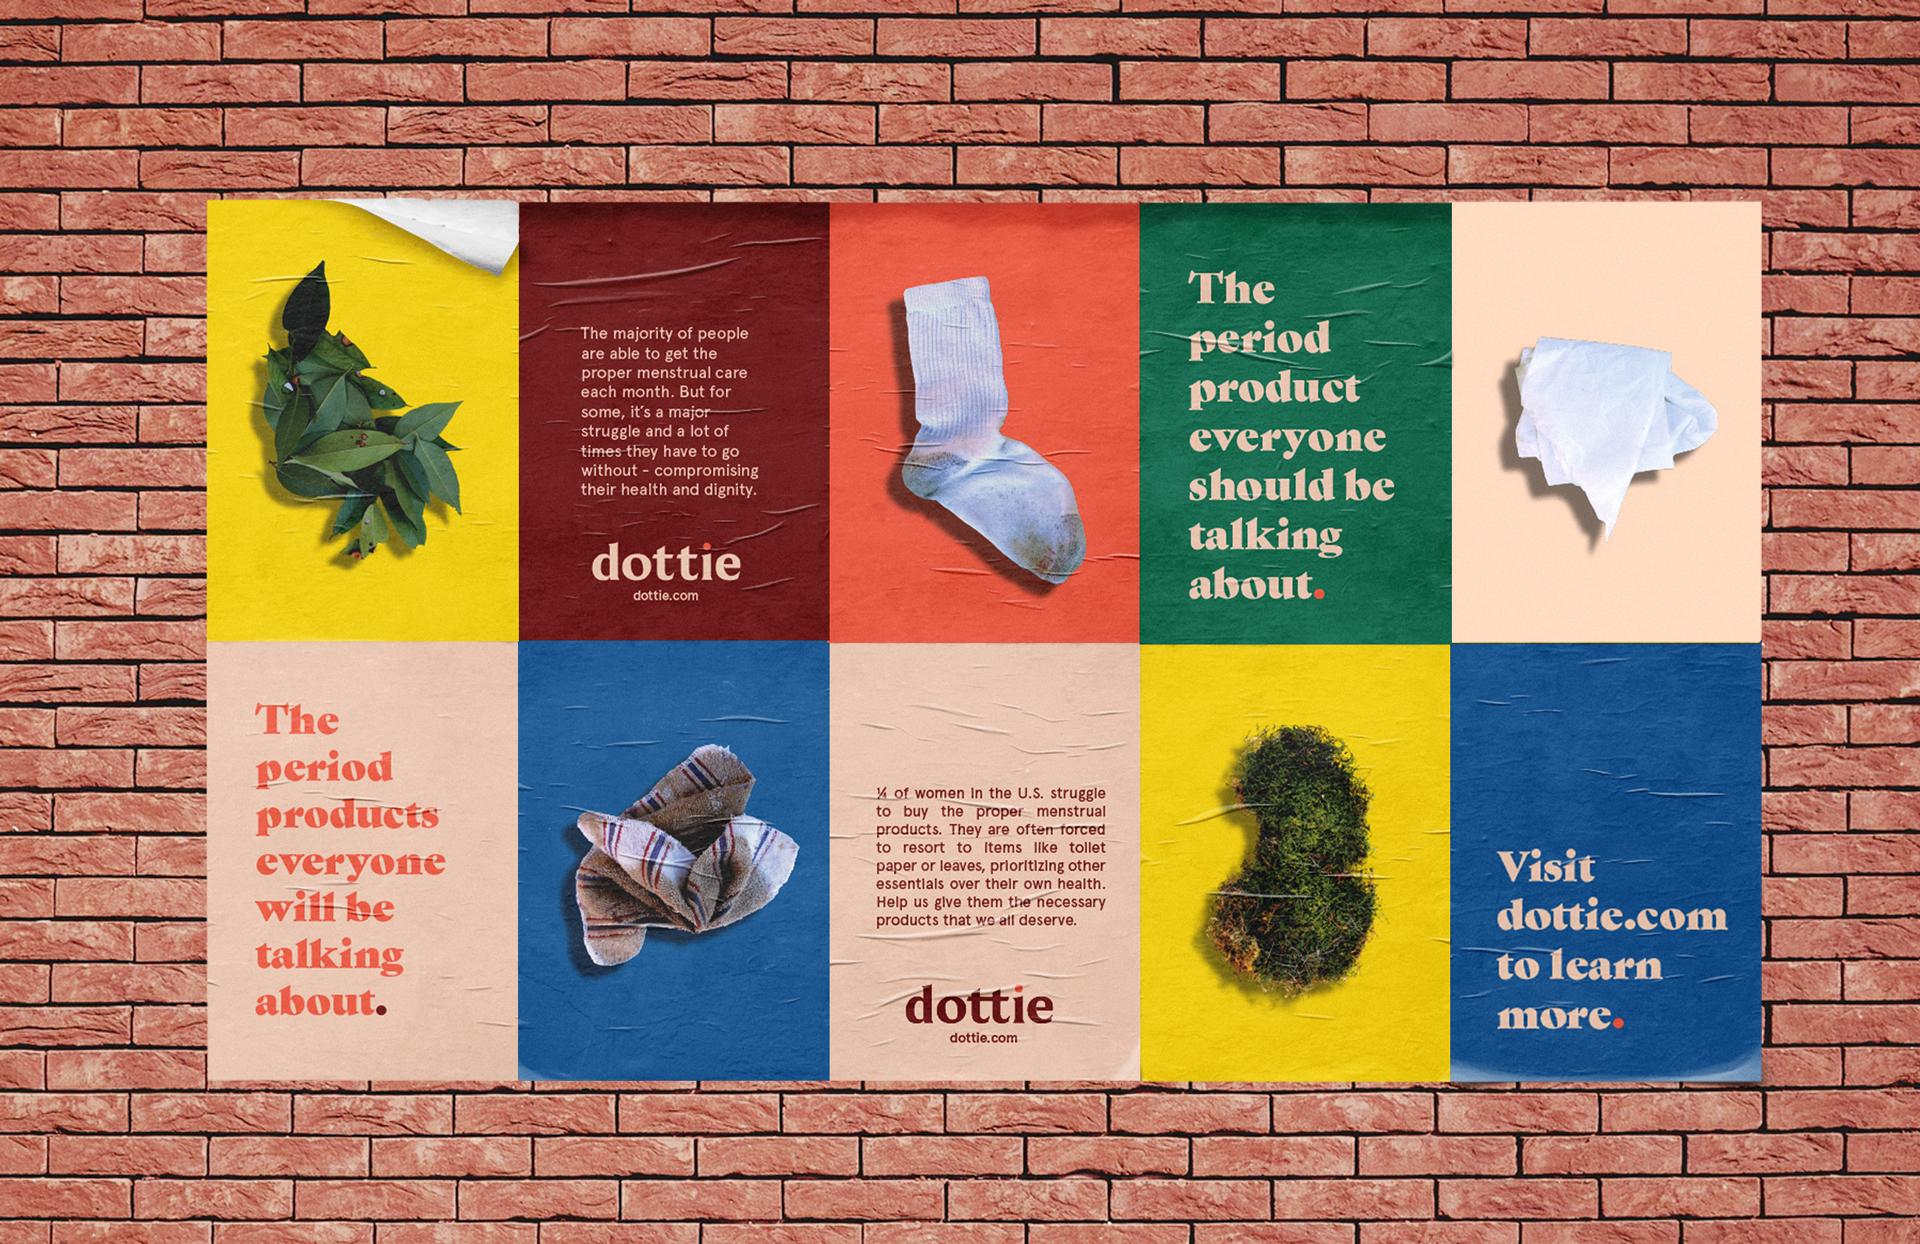 dottie-wildposting2.jpg